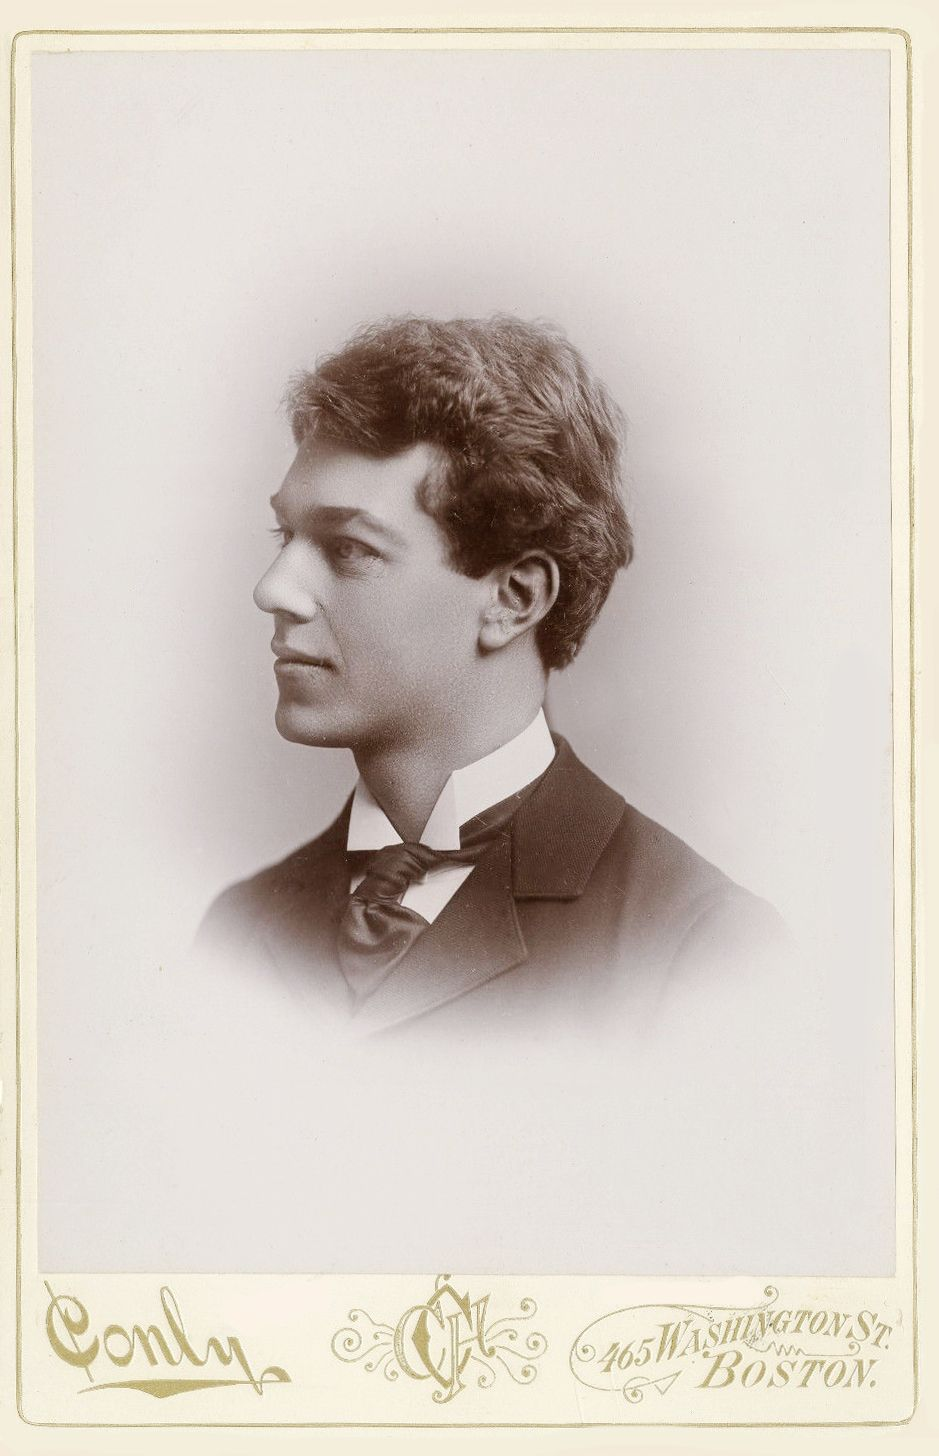 William Henry Goodrich 1894 Boston, Mass.